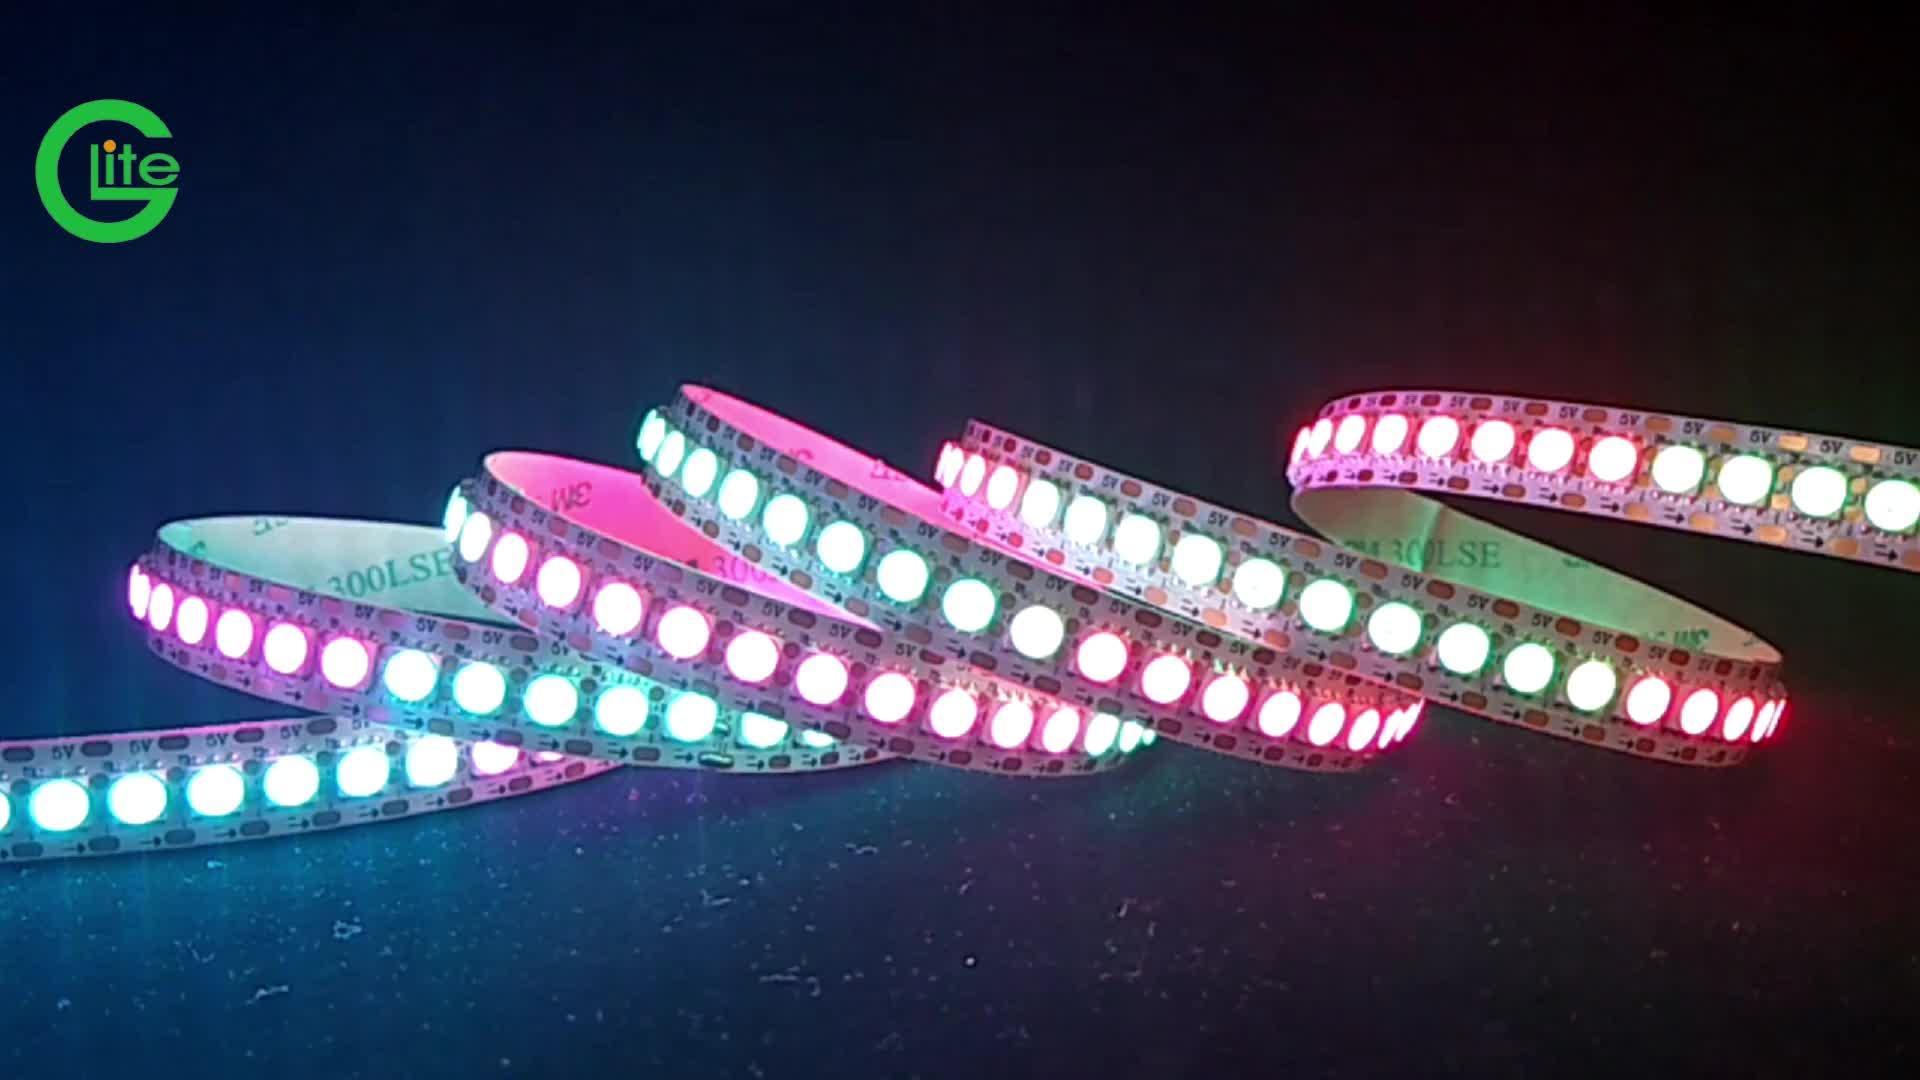 Glite WS2812B بشكل فردي عنونة LED بكسل شريط مرن ضوء 1 متر 144 المصابيح 5050 RGB مصلحة الارصاد الجوية مقاوم للماء IP20 أسود PCB 5 فولت تيار مستمر